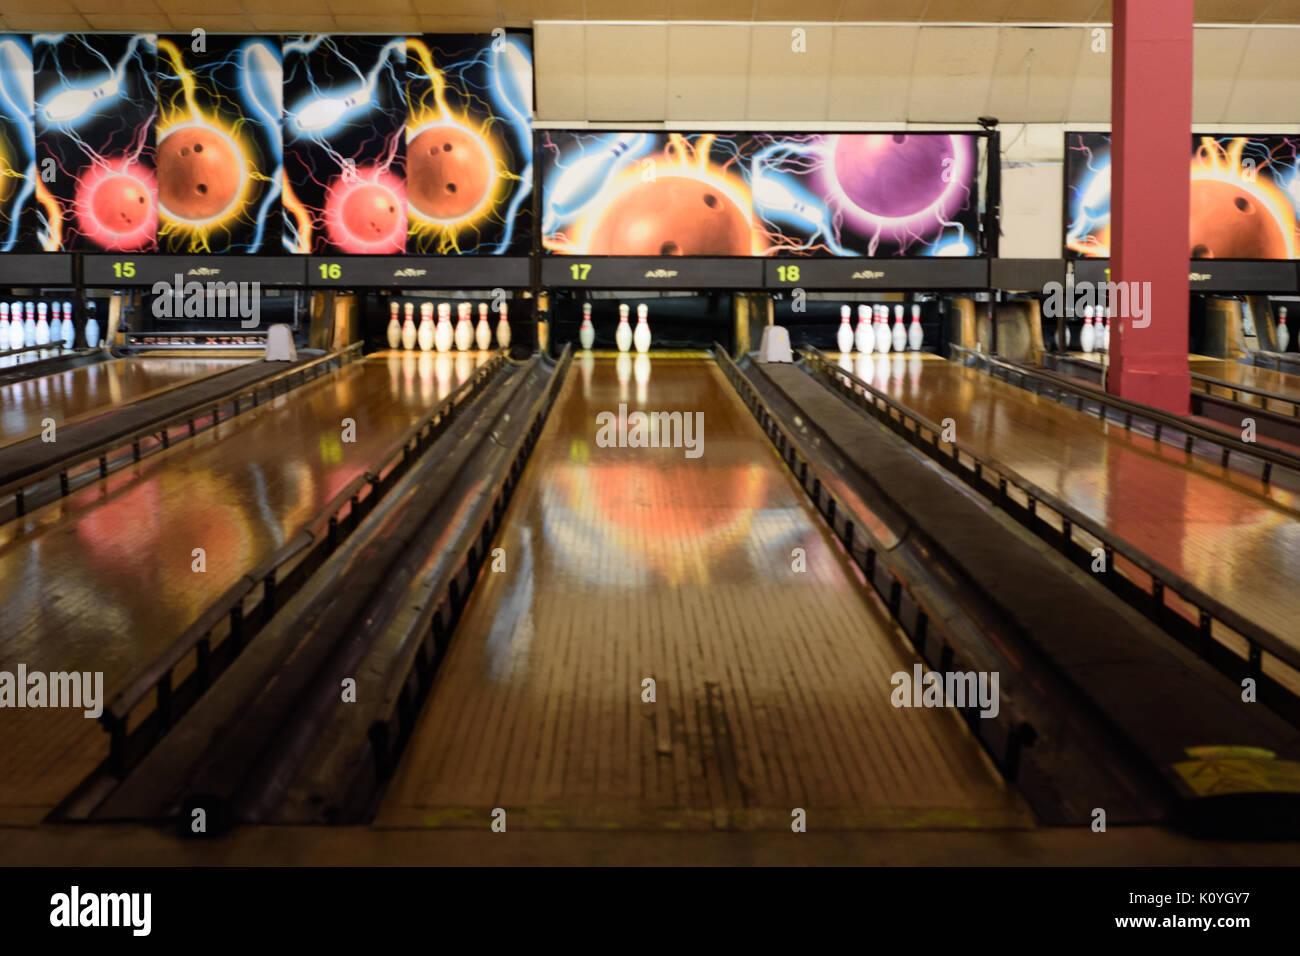 Ten Pin Bowling Stock Photos & Ten Pin Bowling Stock Images - Alamy